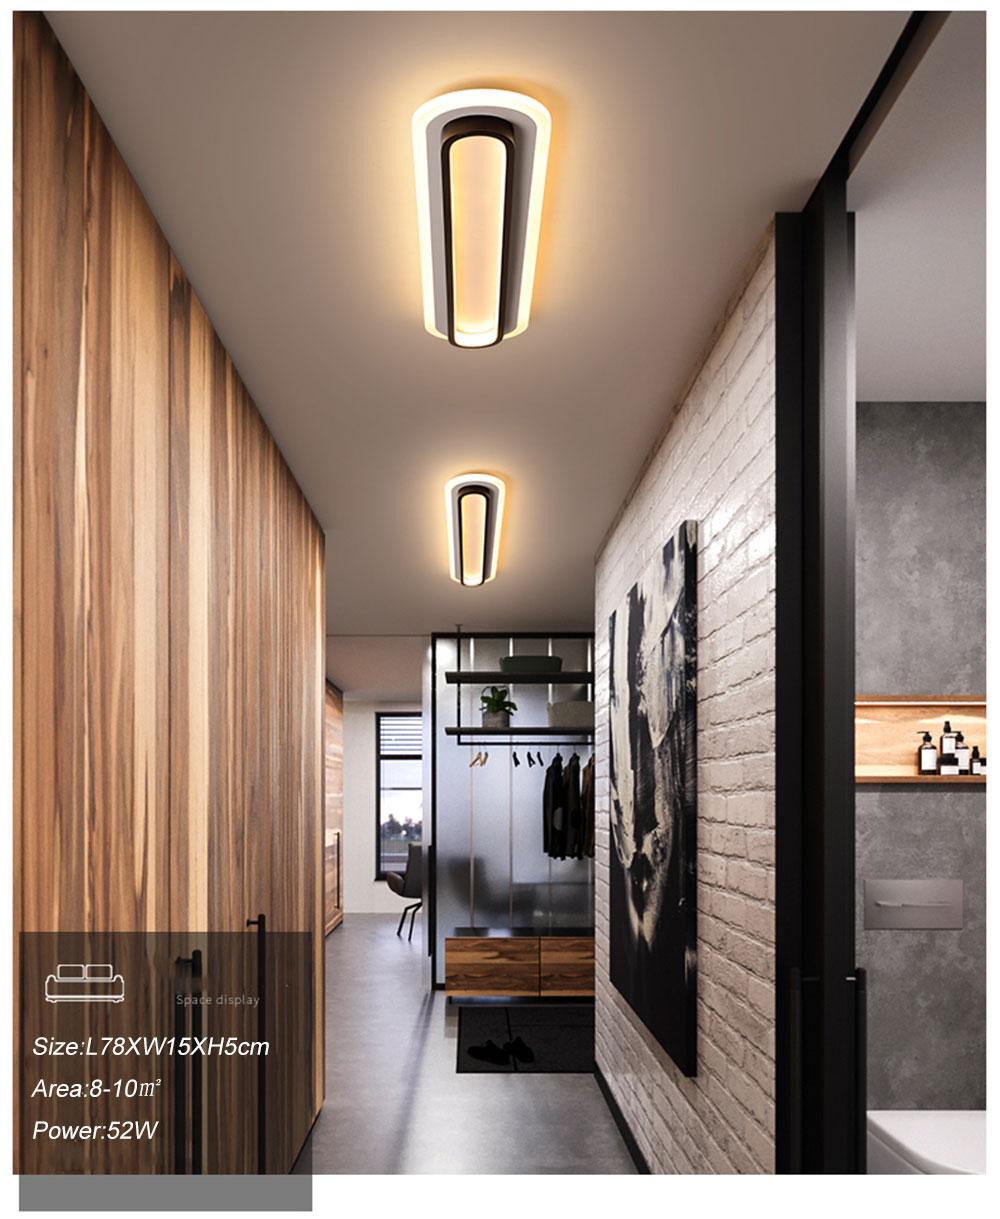 Modern Led Ceiling Lights For Living Room Bedroom Study Room Corridor White black color surface mounted Ceiling Lamp AC85-265V